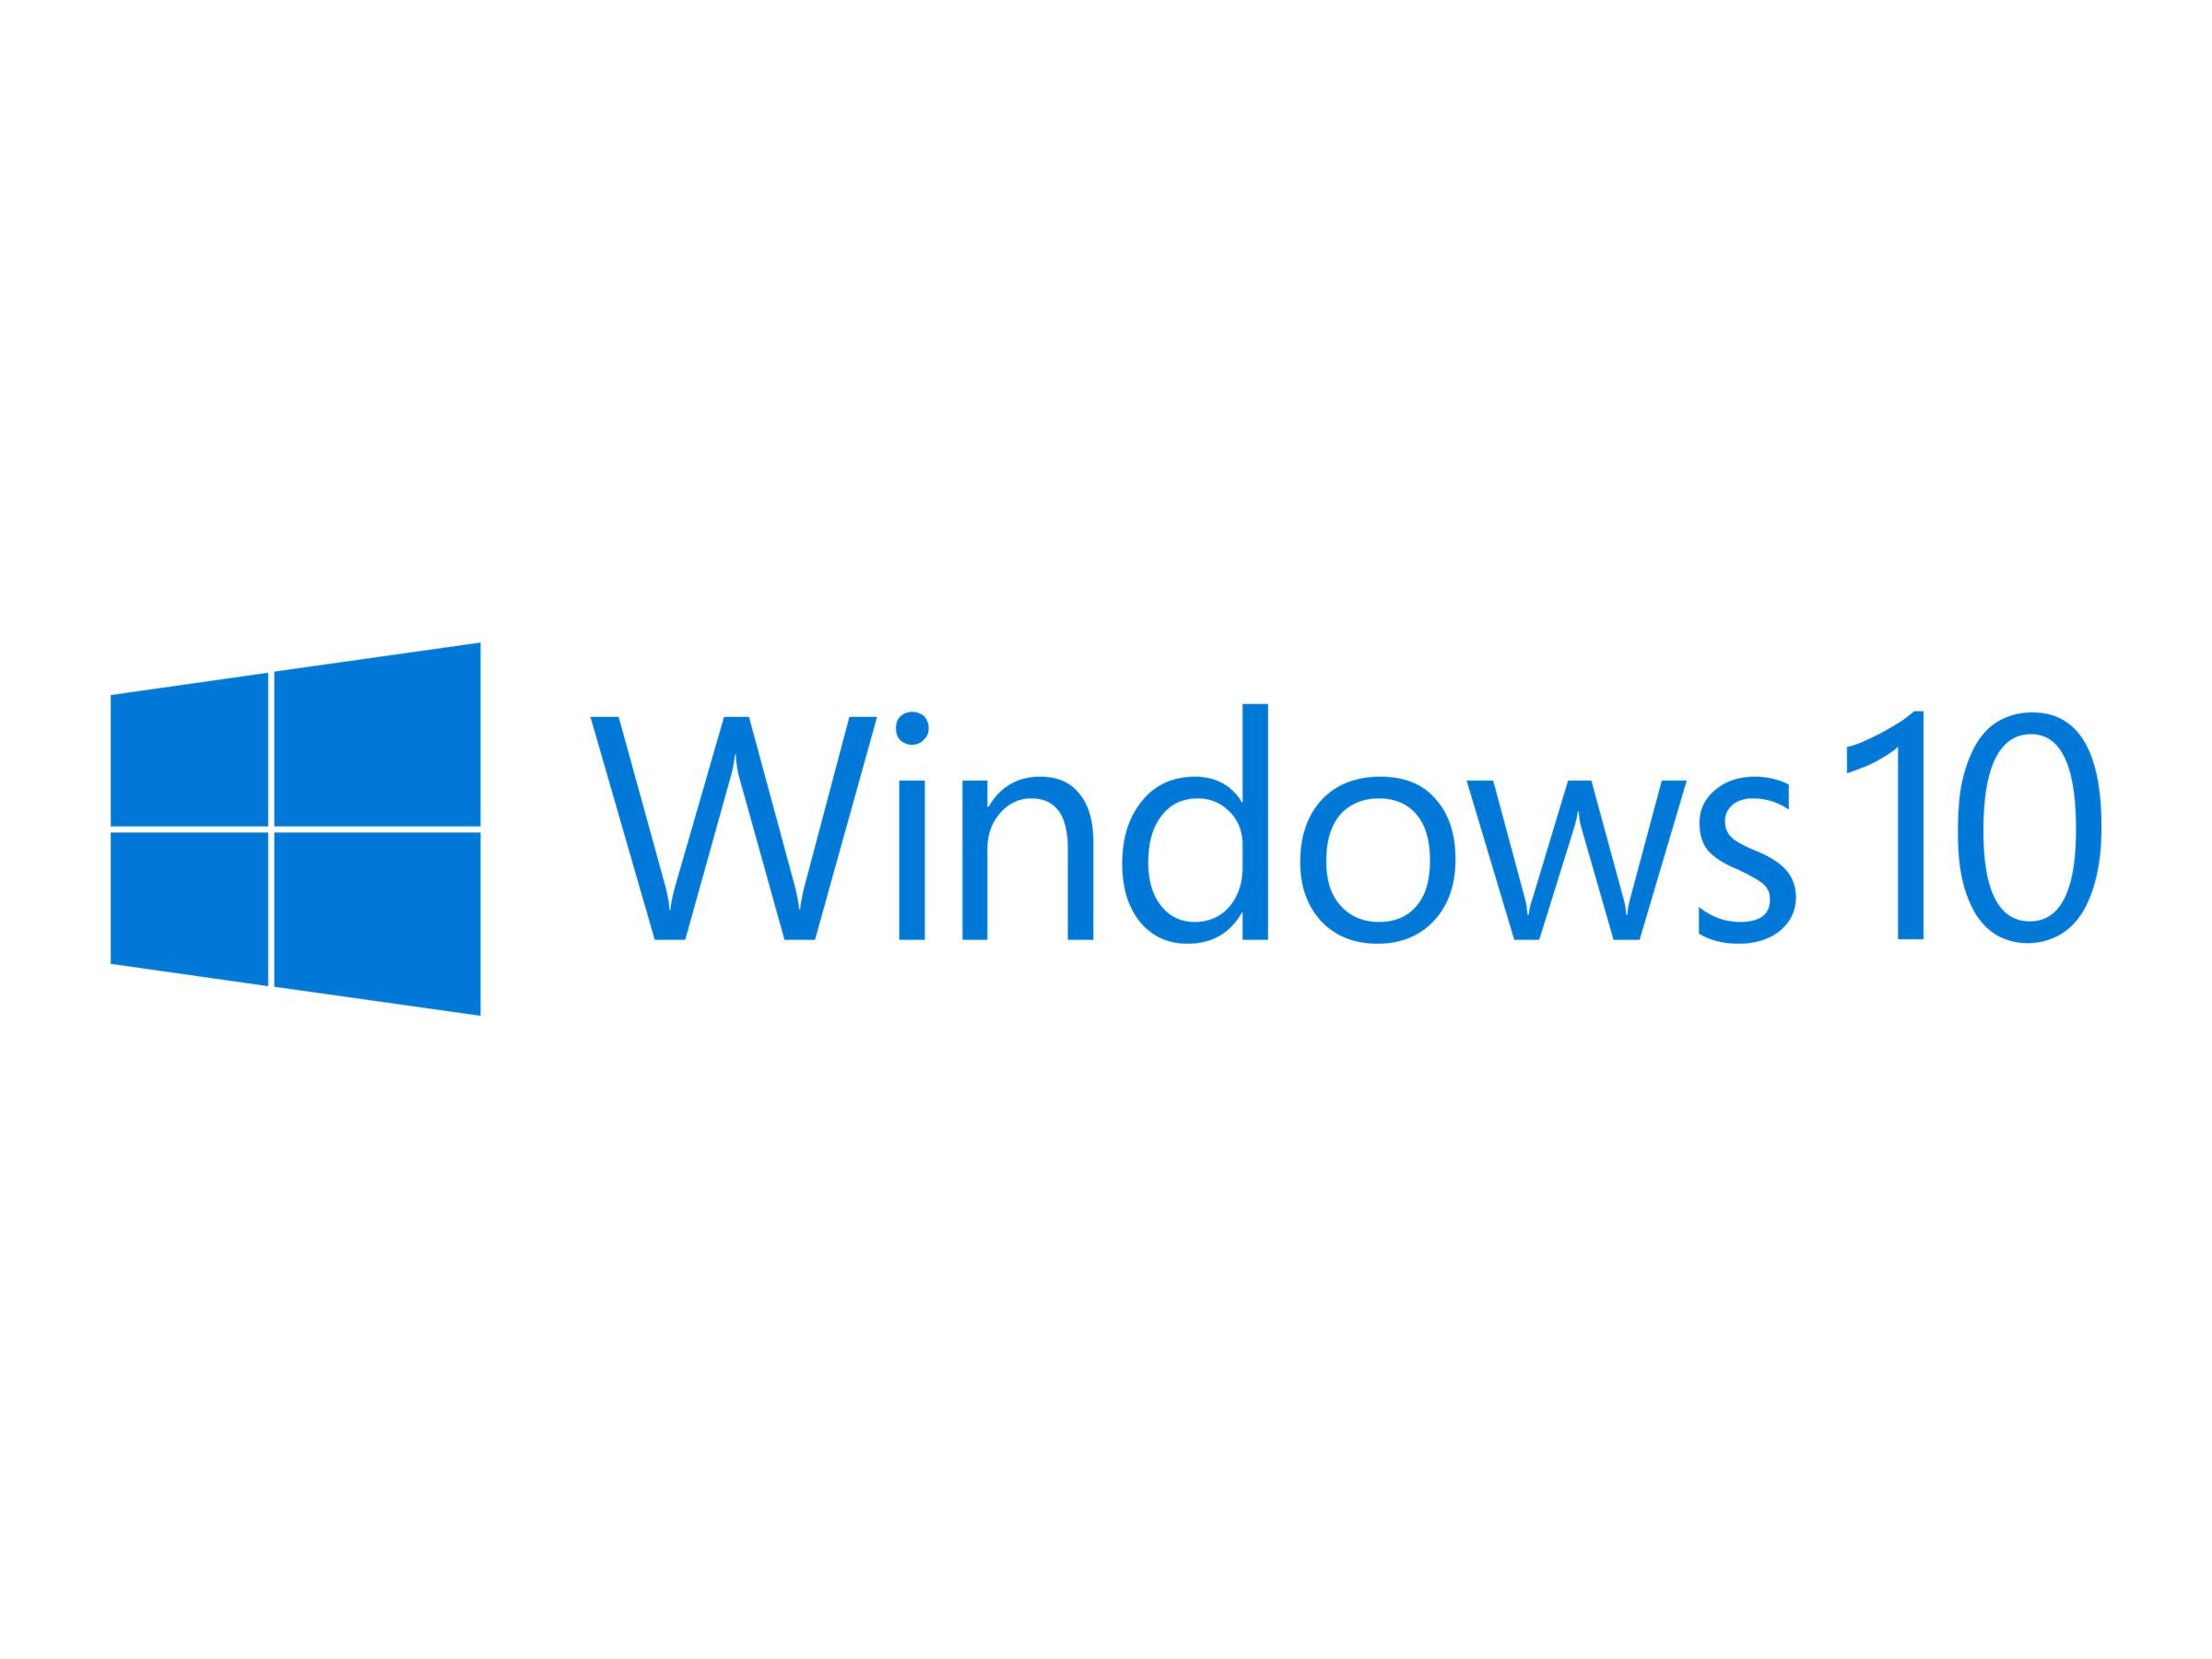 Microsoft Windows 10 Home - Lizenz - 1 Lizenz - OEM - DVD